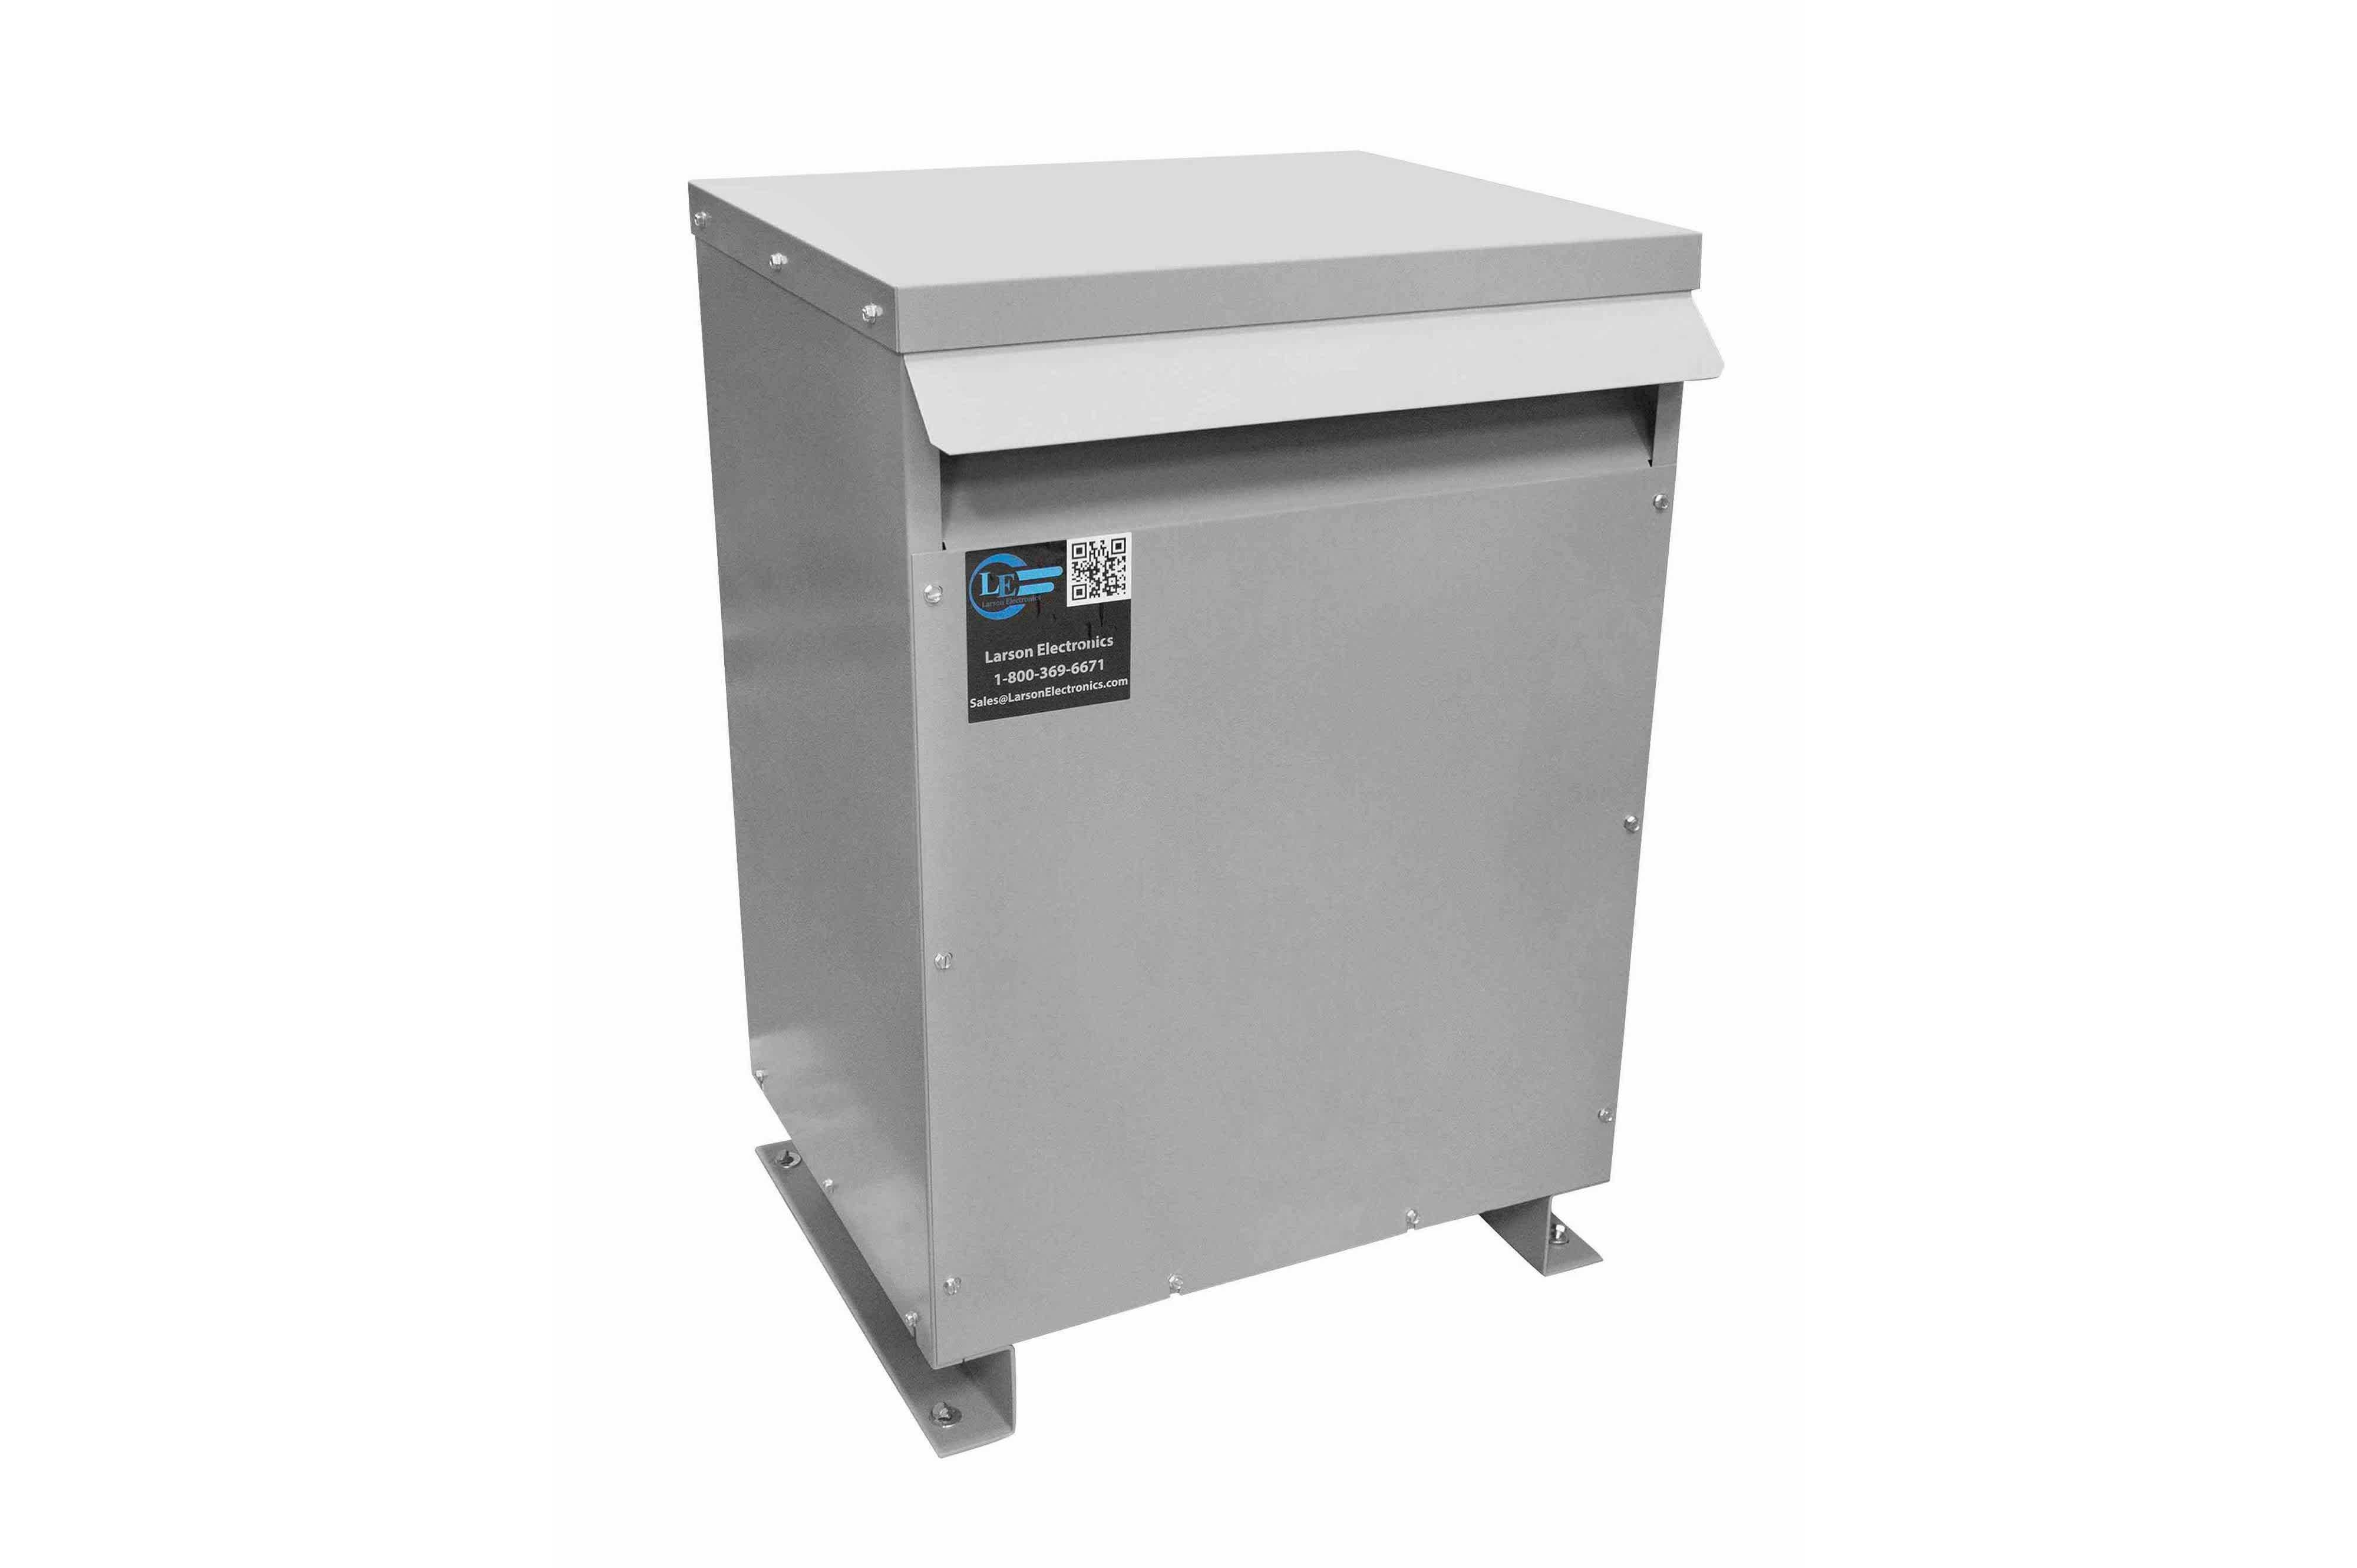 47.5 kVA 3PH Isolation Transformer, 575V Wye Primary, 380Y/220 Wye-N Secondary, N3R, Ventilated, 60 Hz